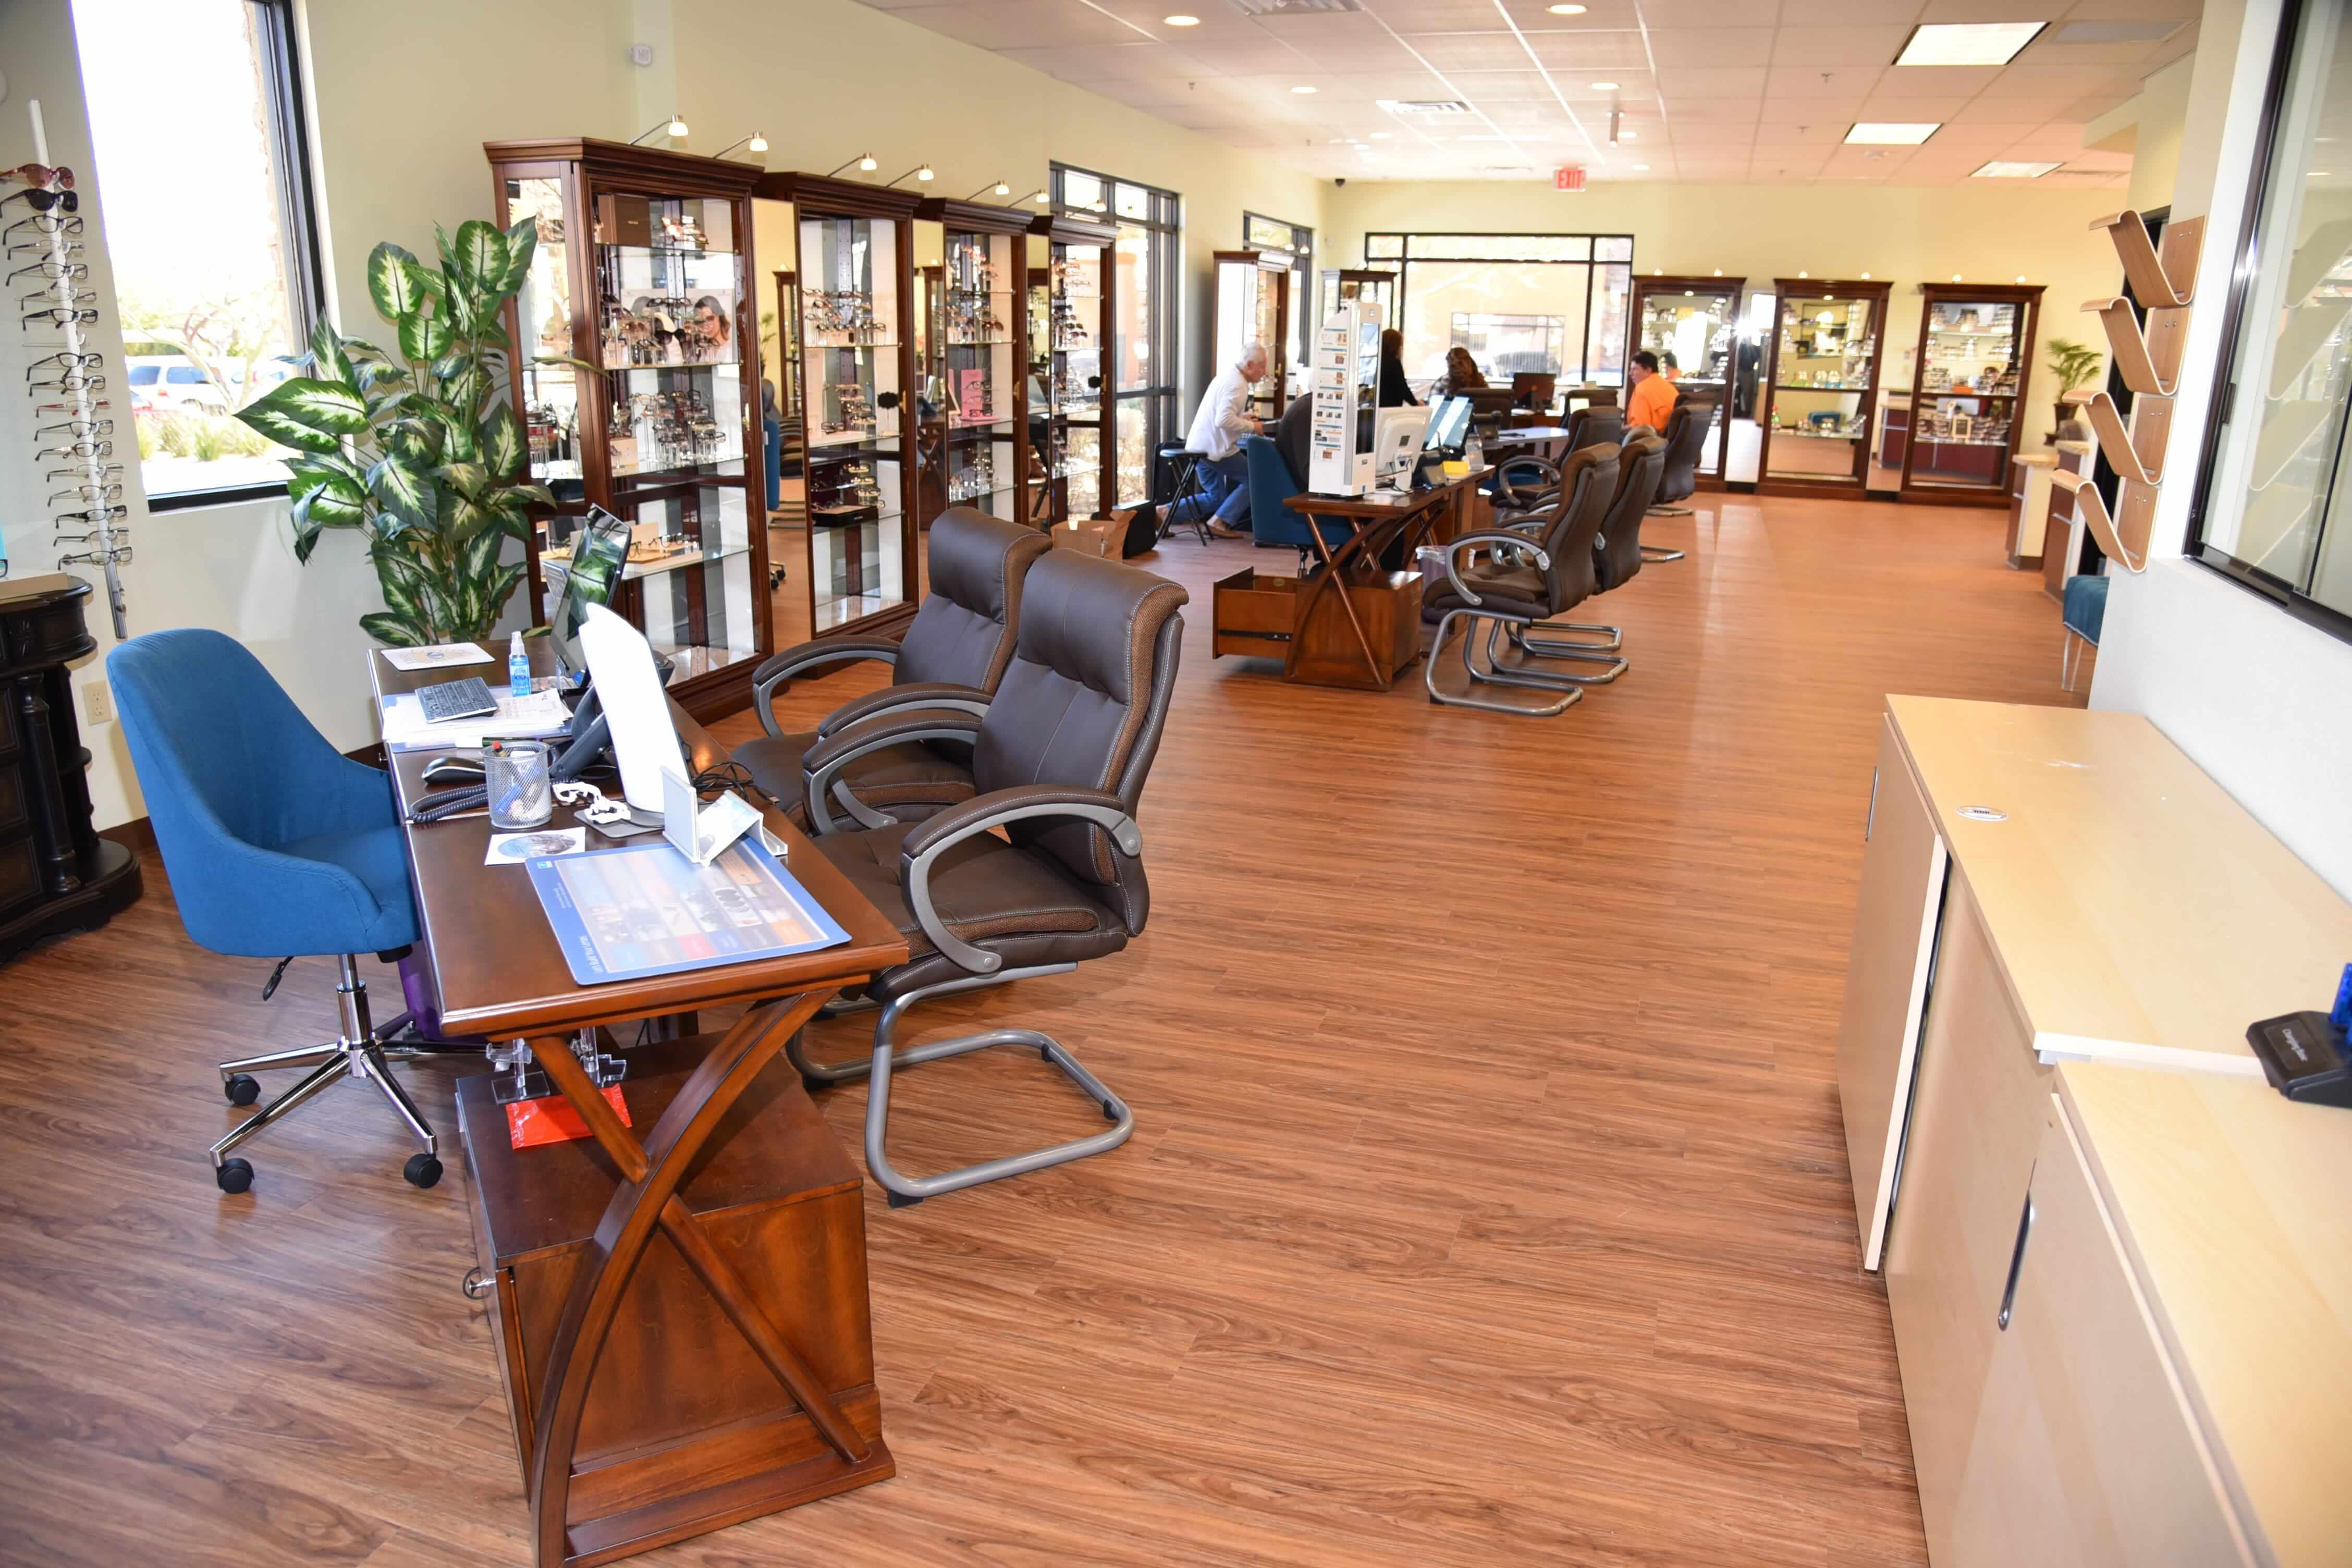 inside our vision center